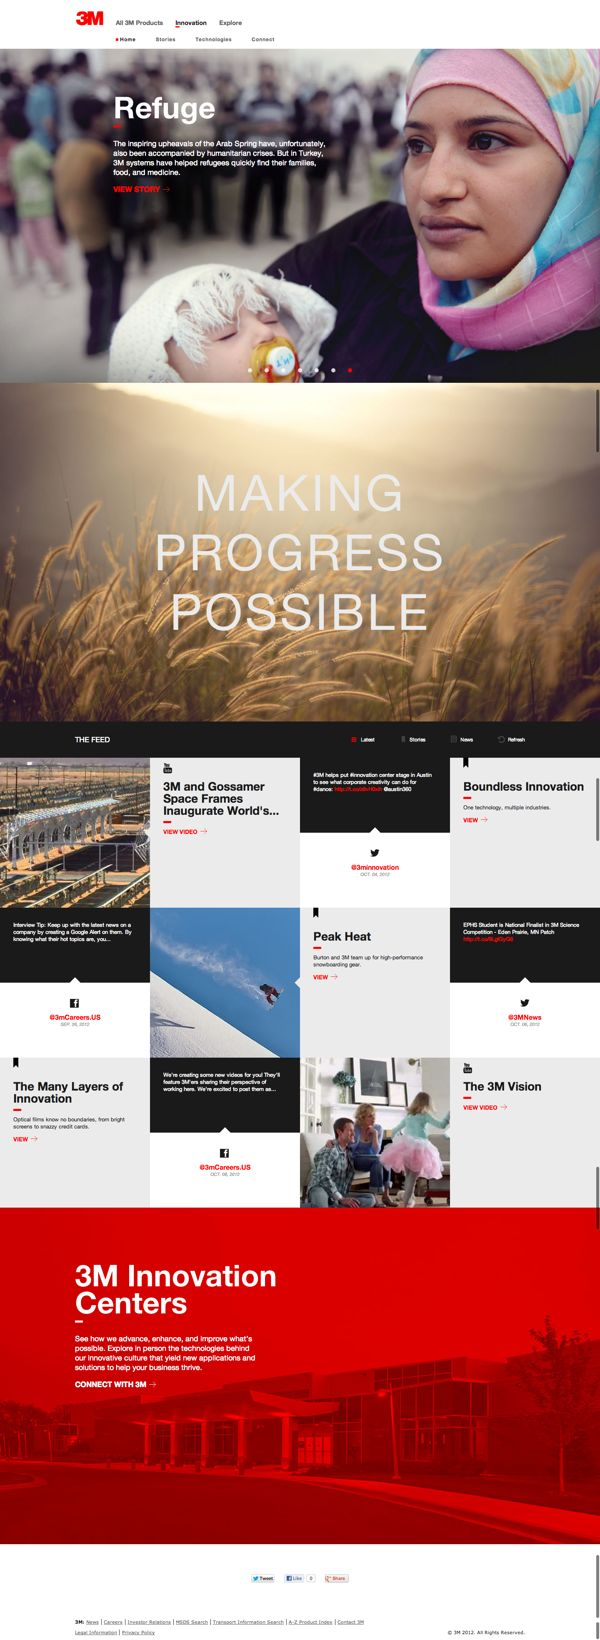 Best 25+ Innovative websites ideas on Pinterest | Innovation ...